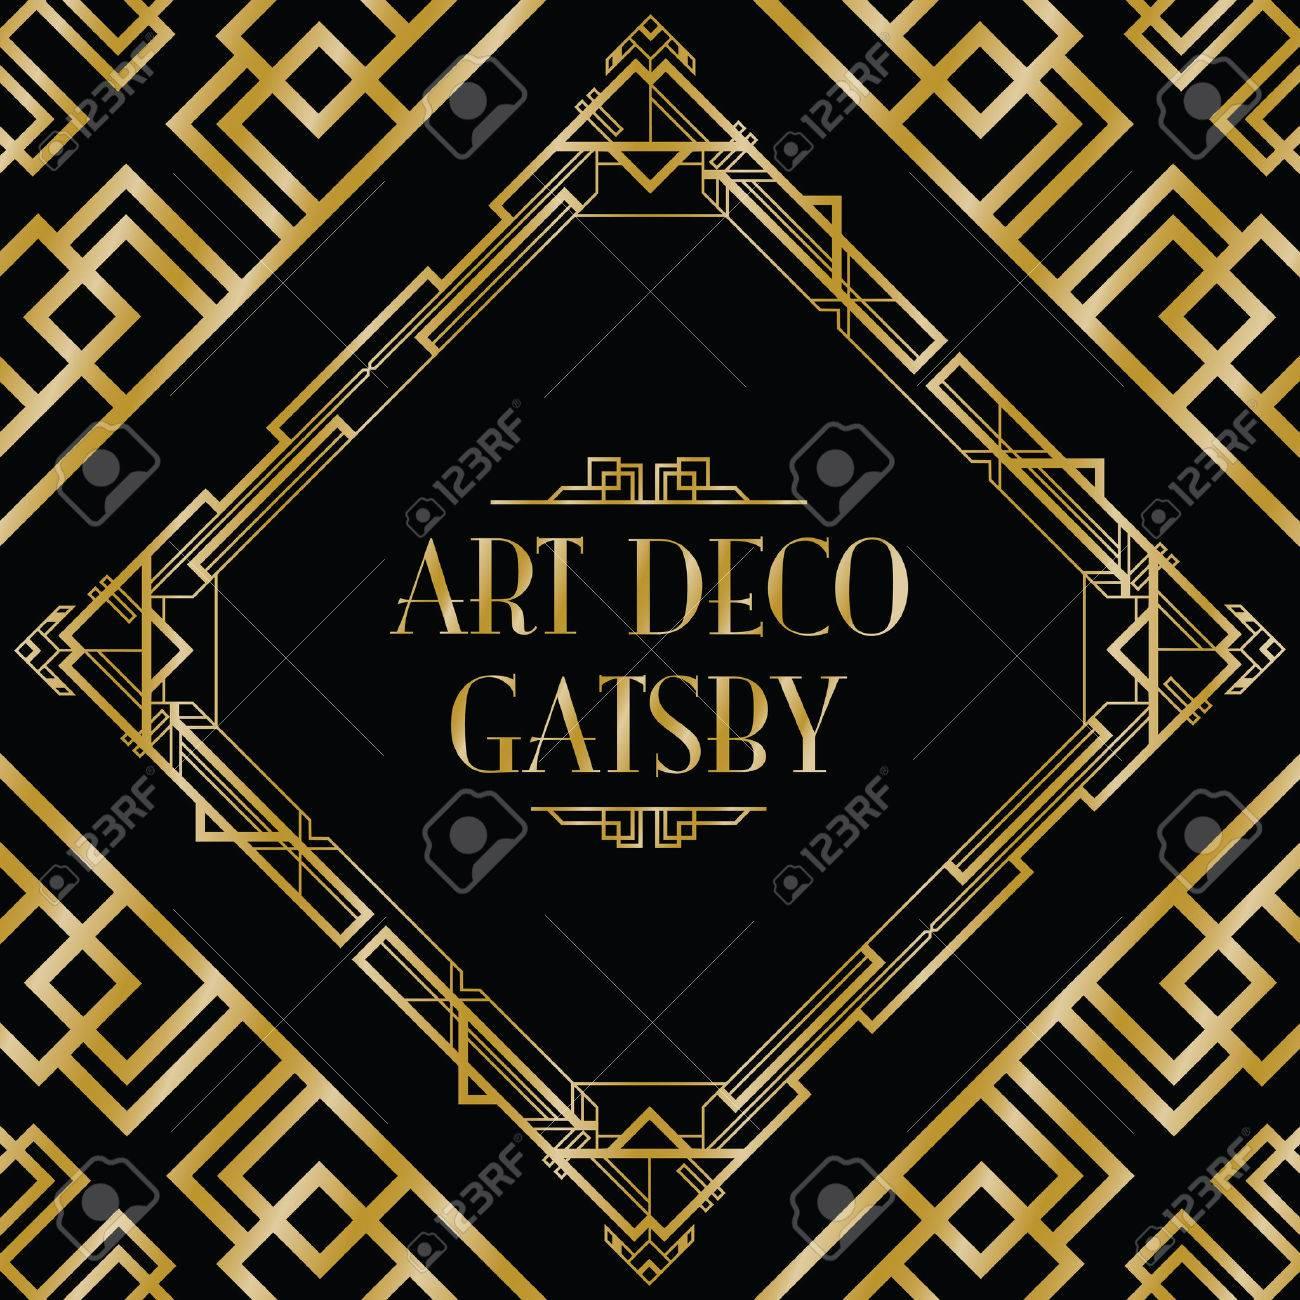 Art deco gatsby style background art deco gatsby style background 32359001 voltagebd Images